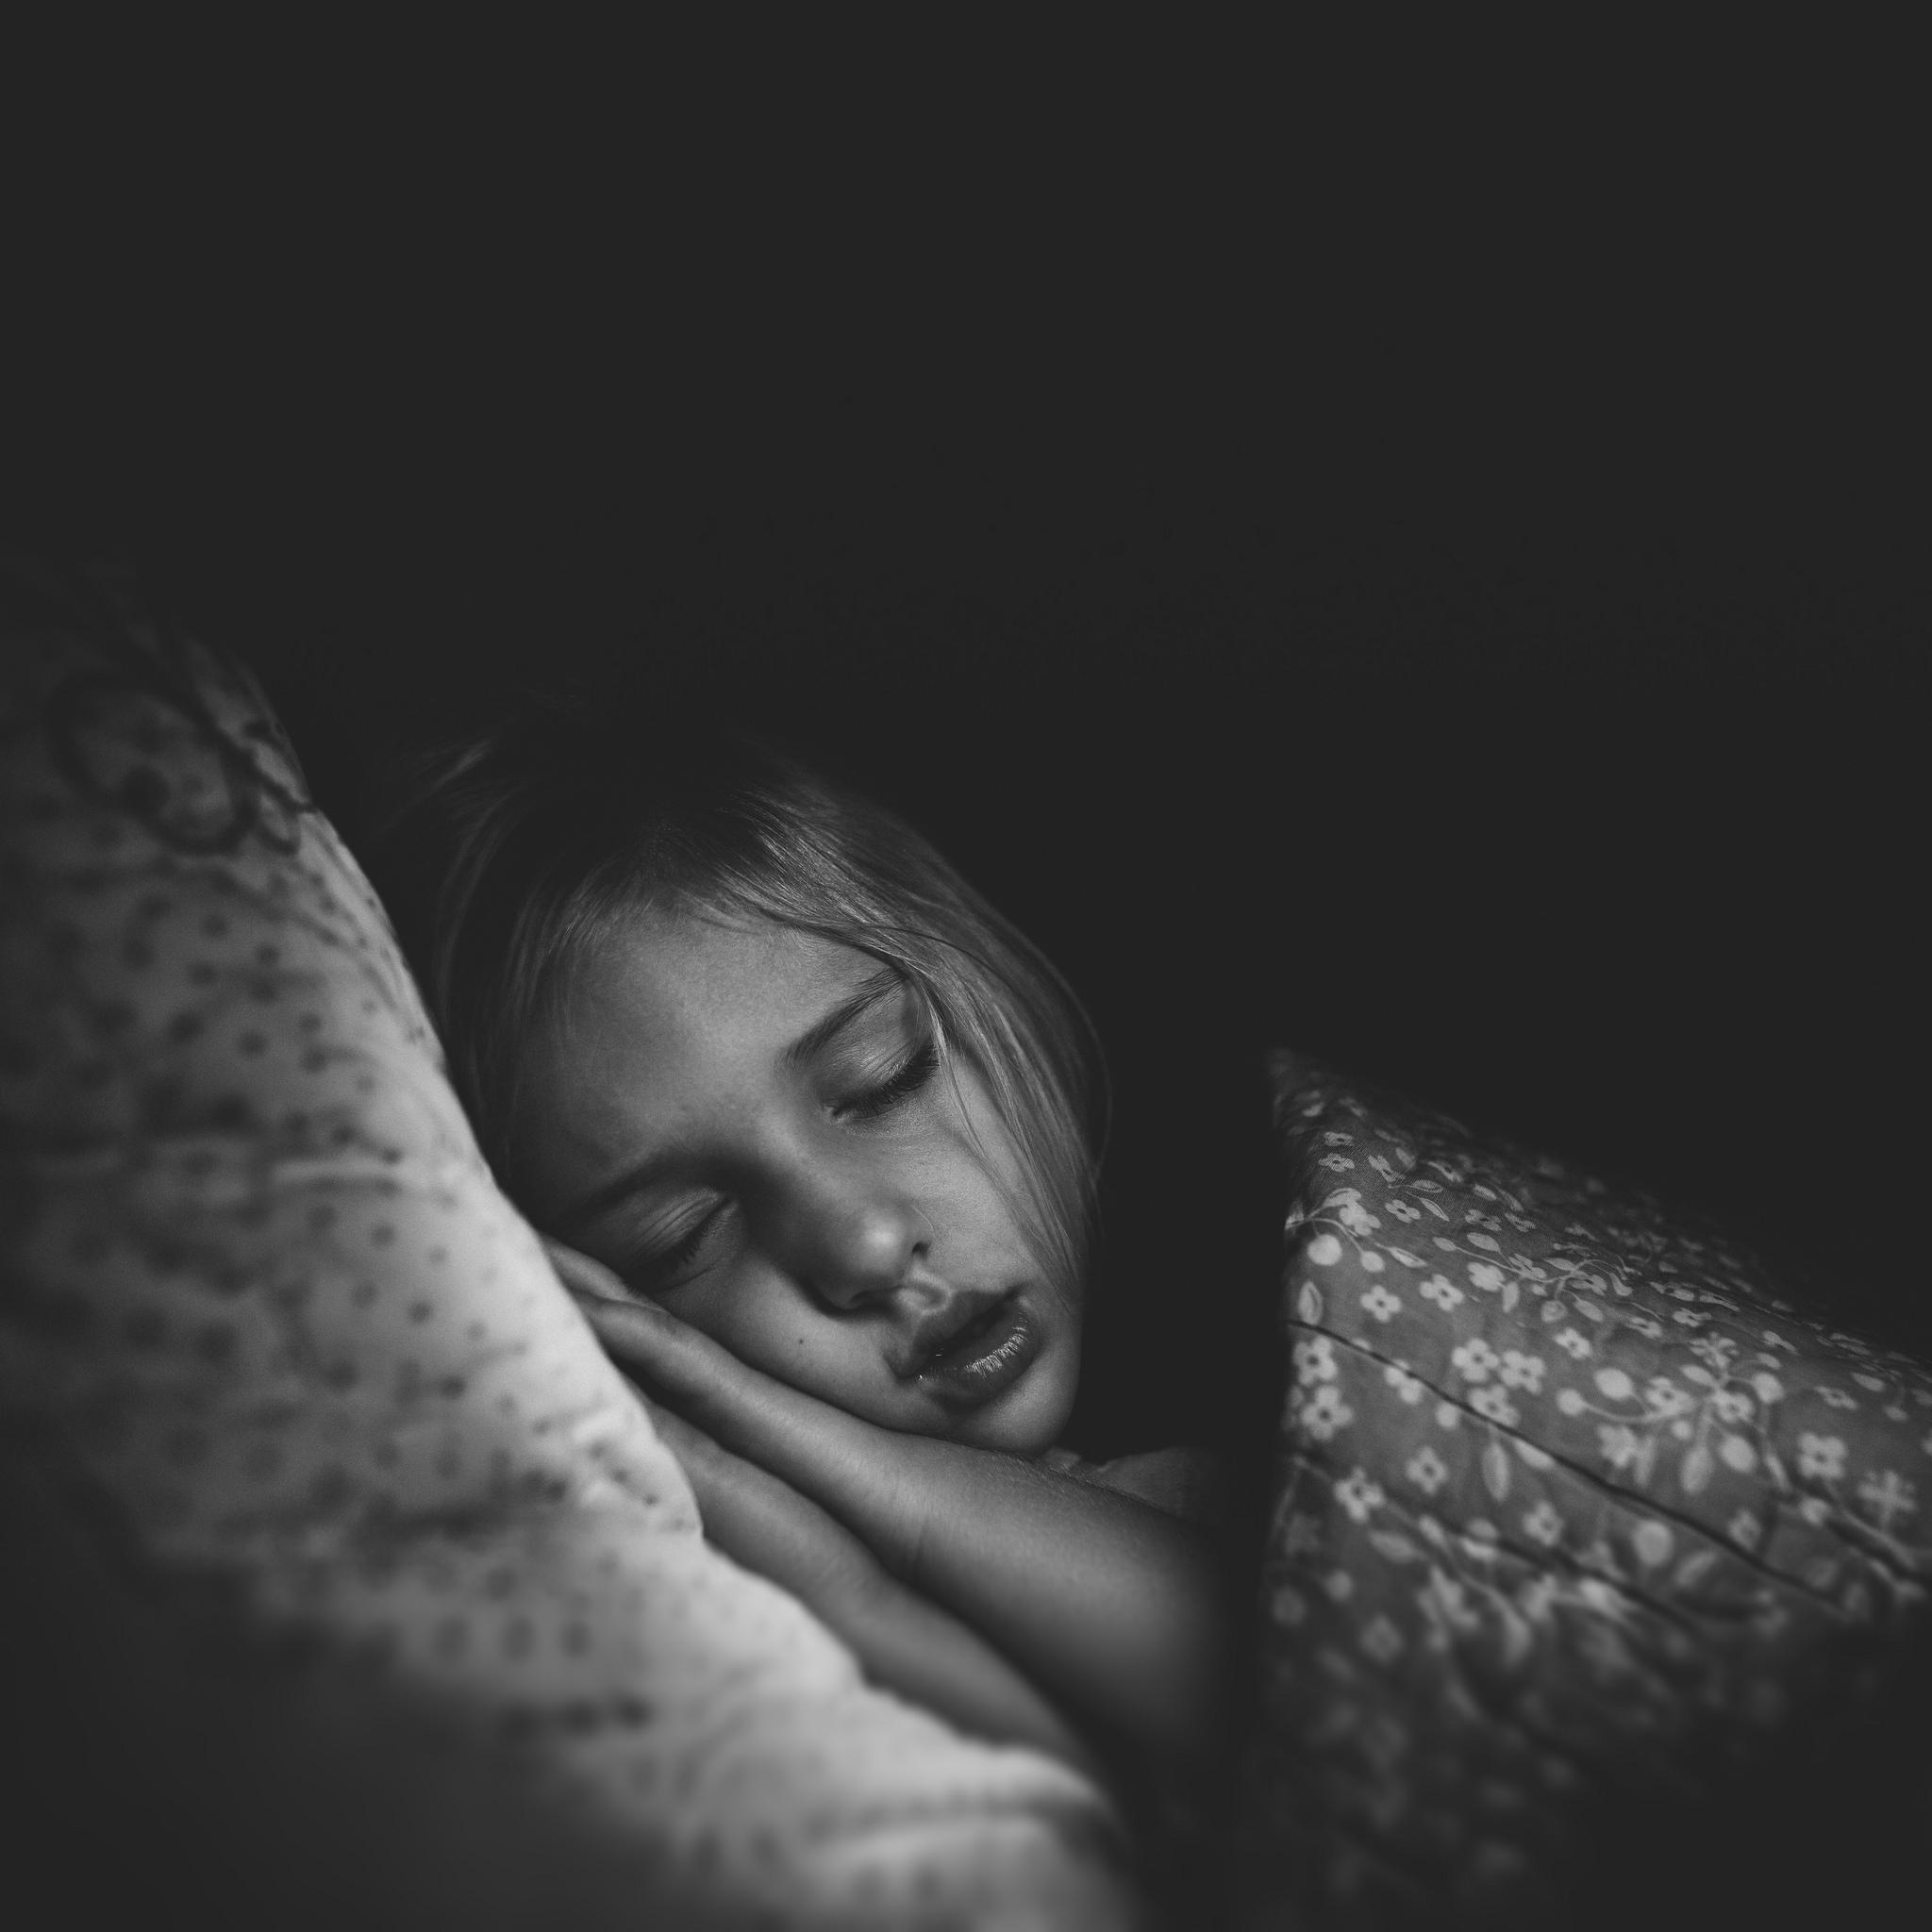 hello-olivia-photography-family-photojournalism-365-tutorial-documenting-bedtime-rituals-lowlight-kids-documentary-and lifestyle-photographer-long-island-new-york7.jpg